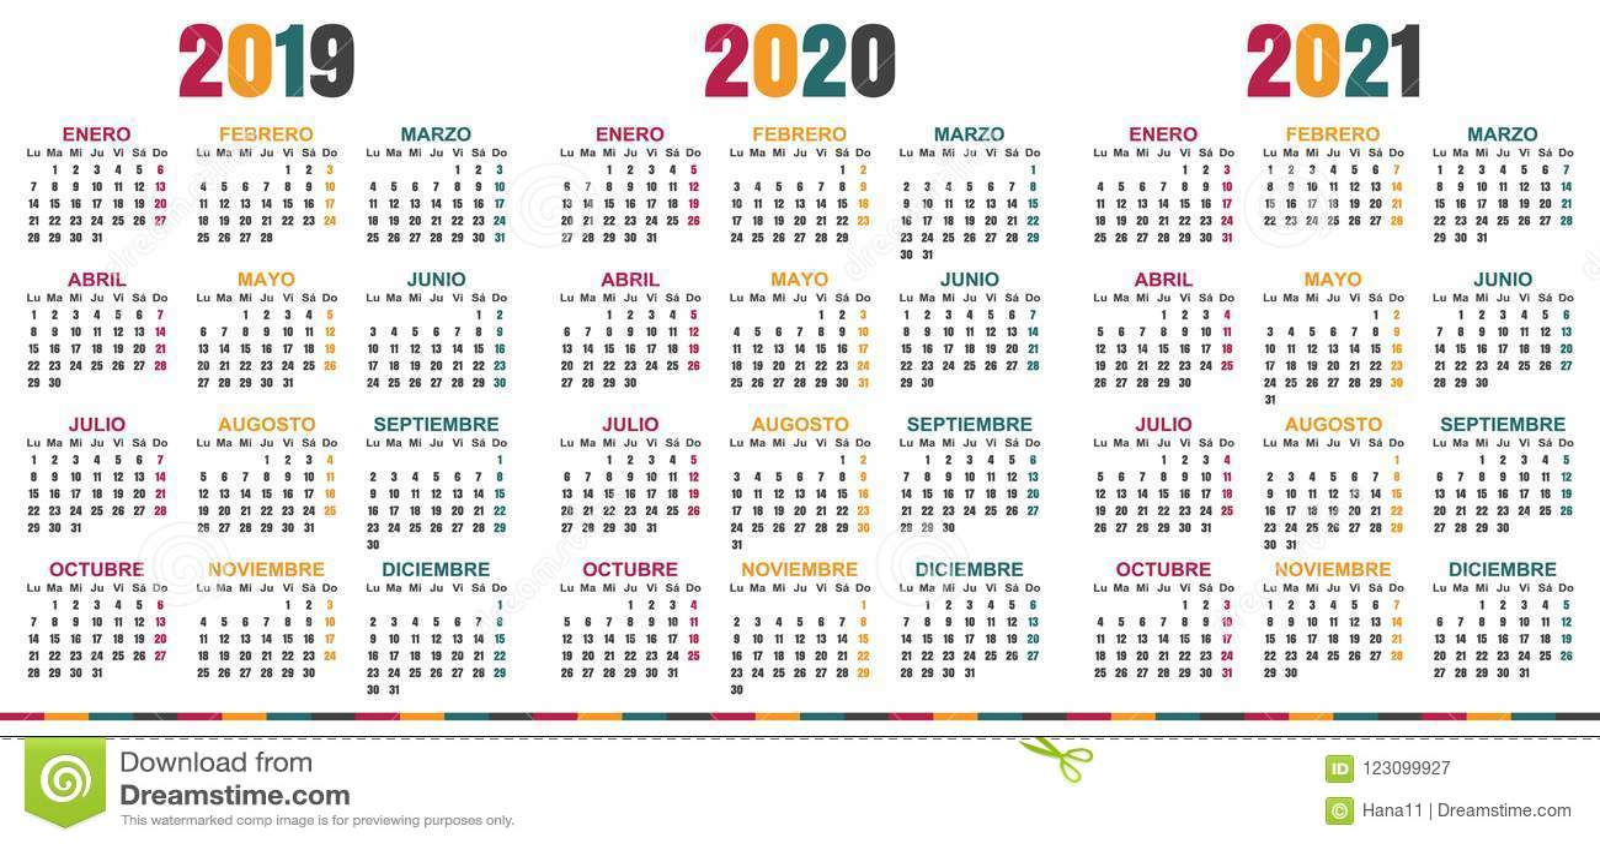 Calendrier Espagnol 2019 2021 Illustration de Vecteur